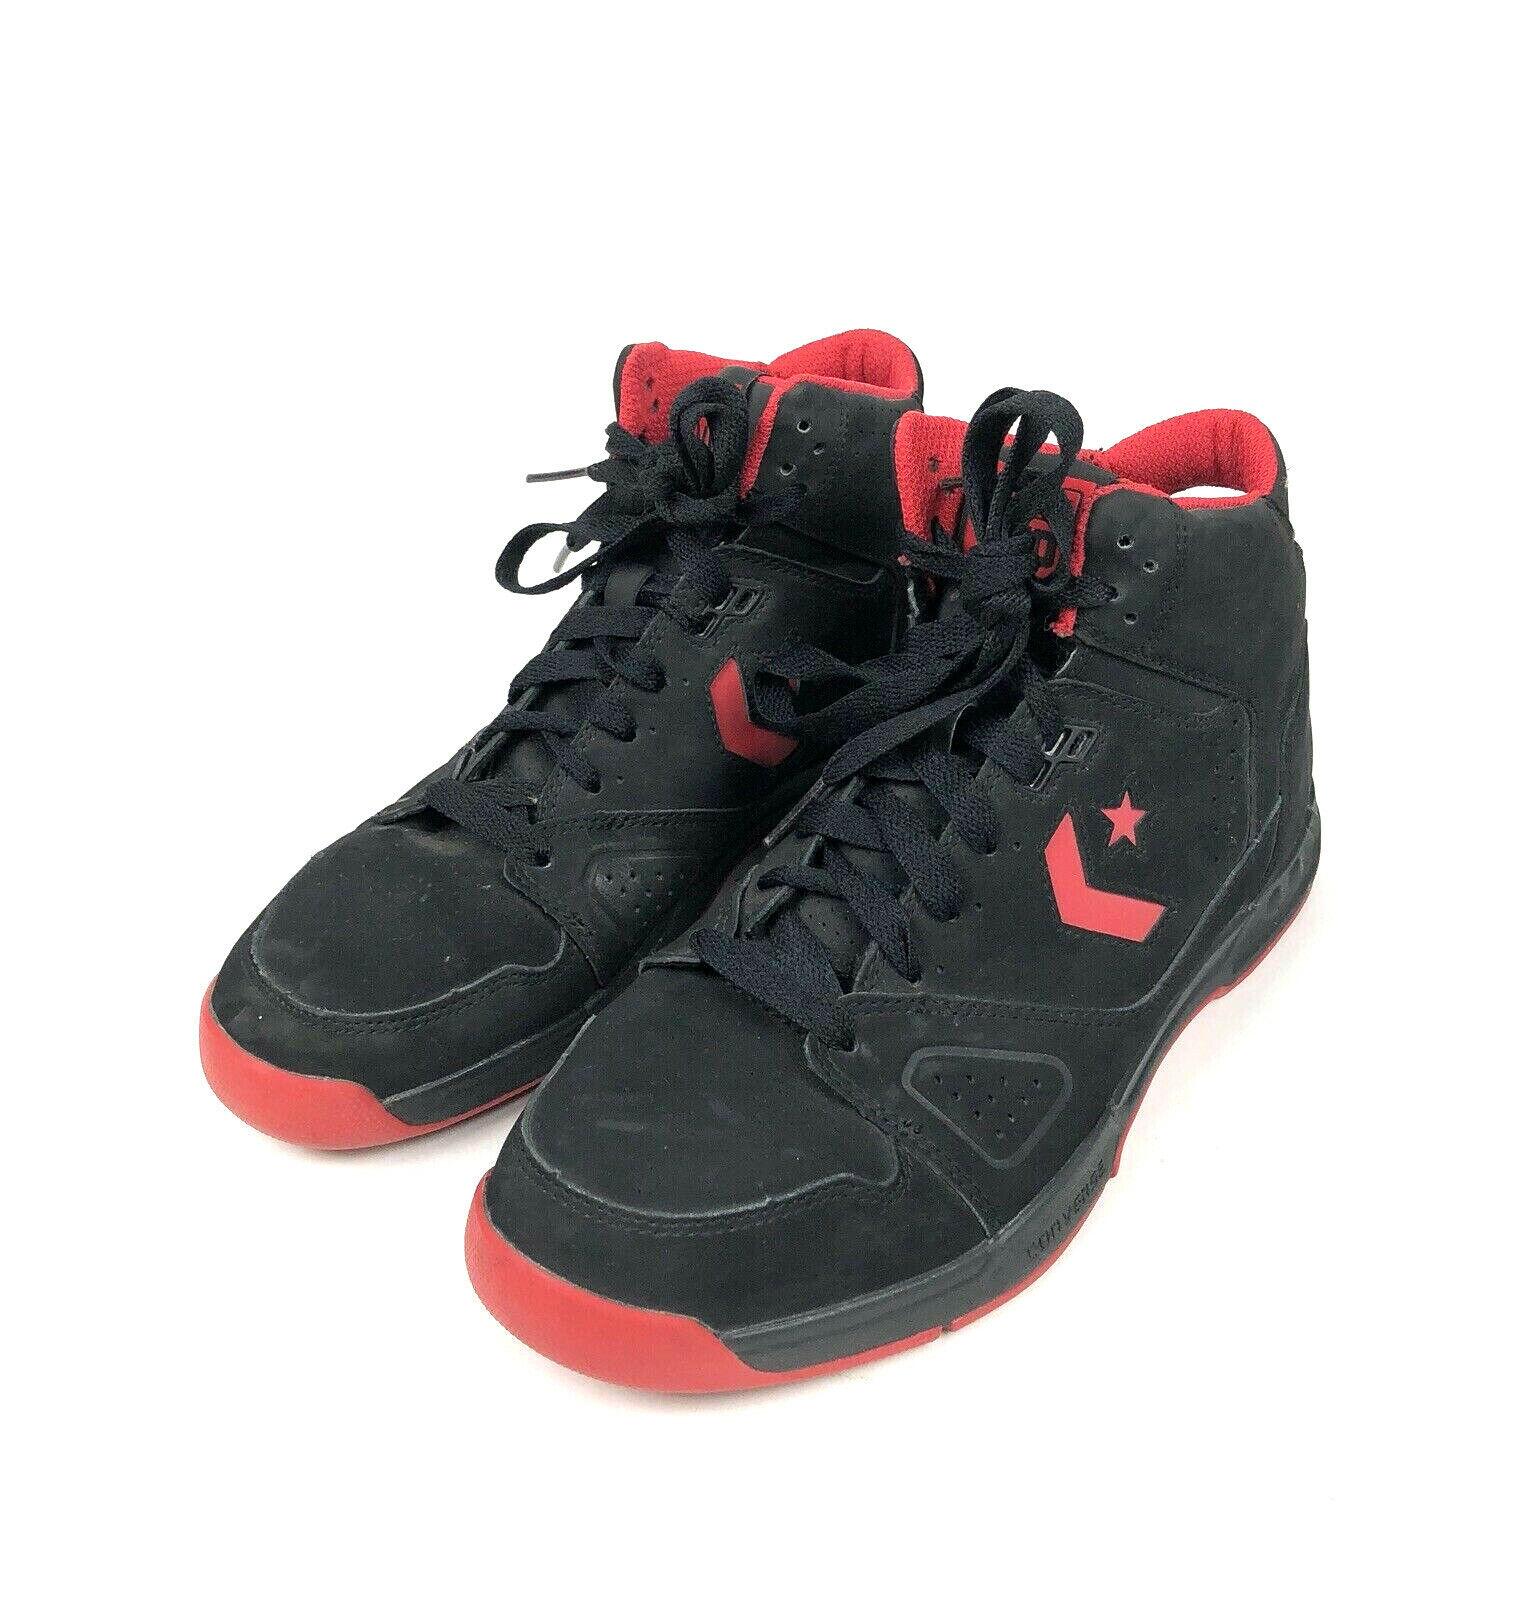 Converse Evo Basketball Sneakers Men's Size 10 Drop Step Mid Black Varsity